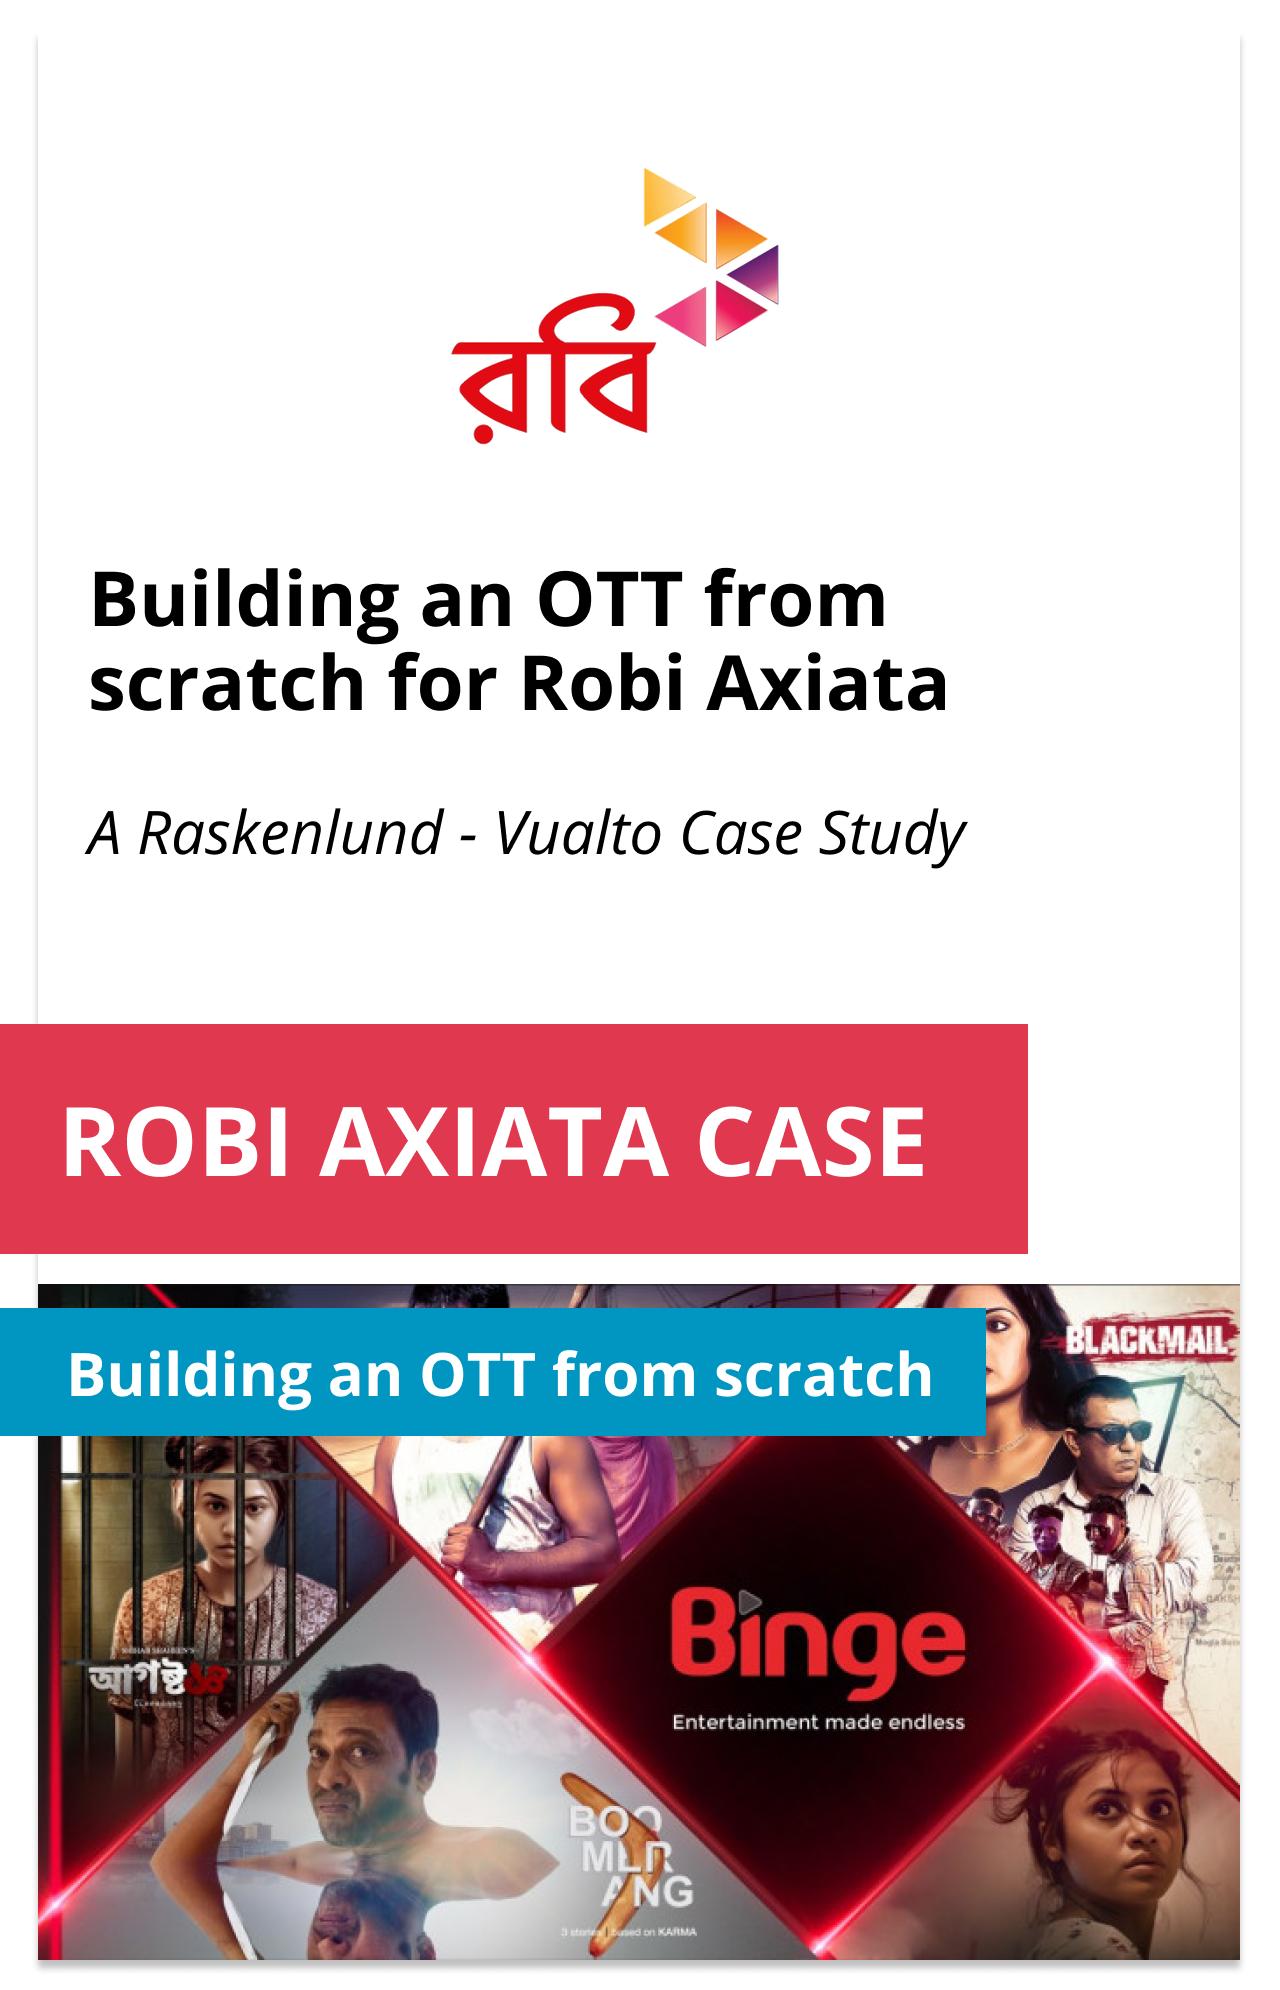 Robi Axiata Case Study